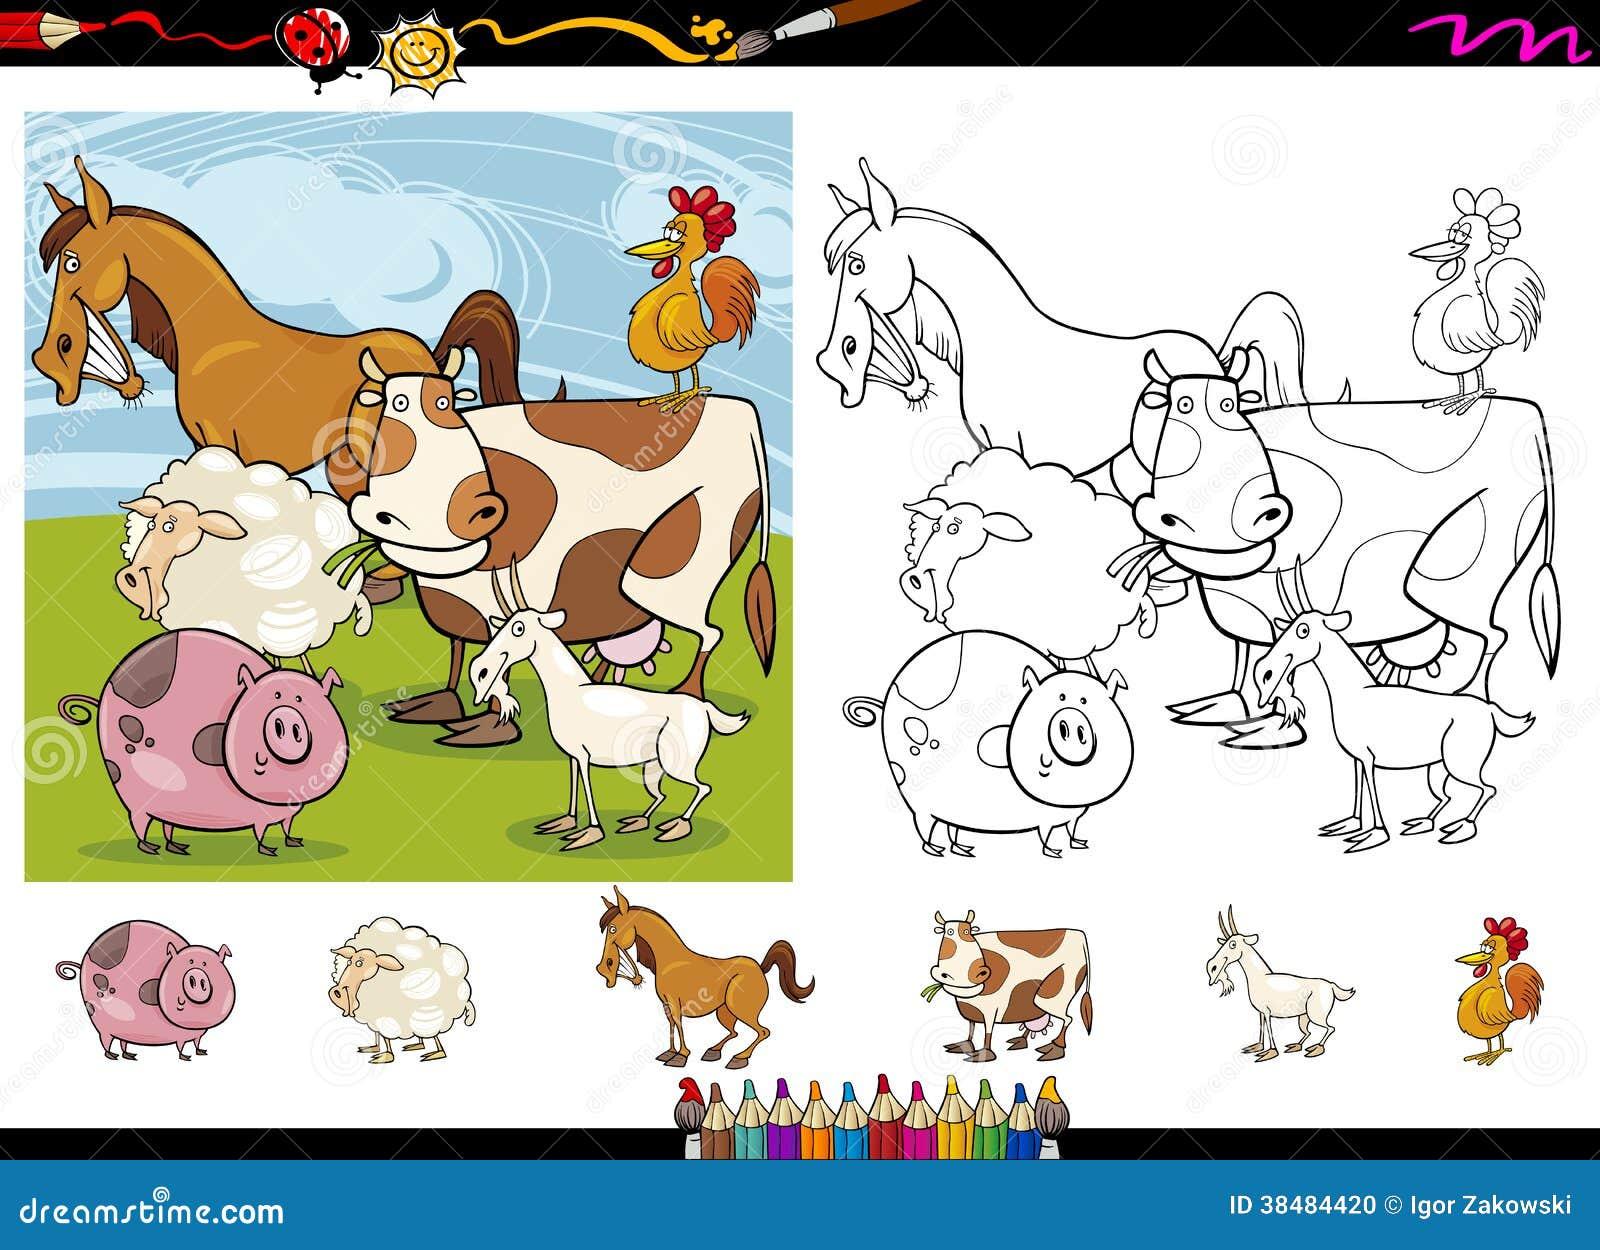 Farm Animals Cartoon Coloring Page Set Stock Photo - Image ...